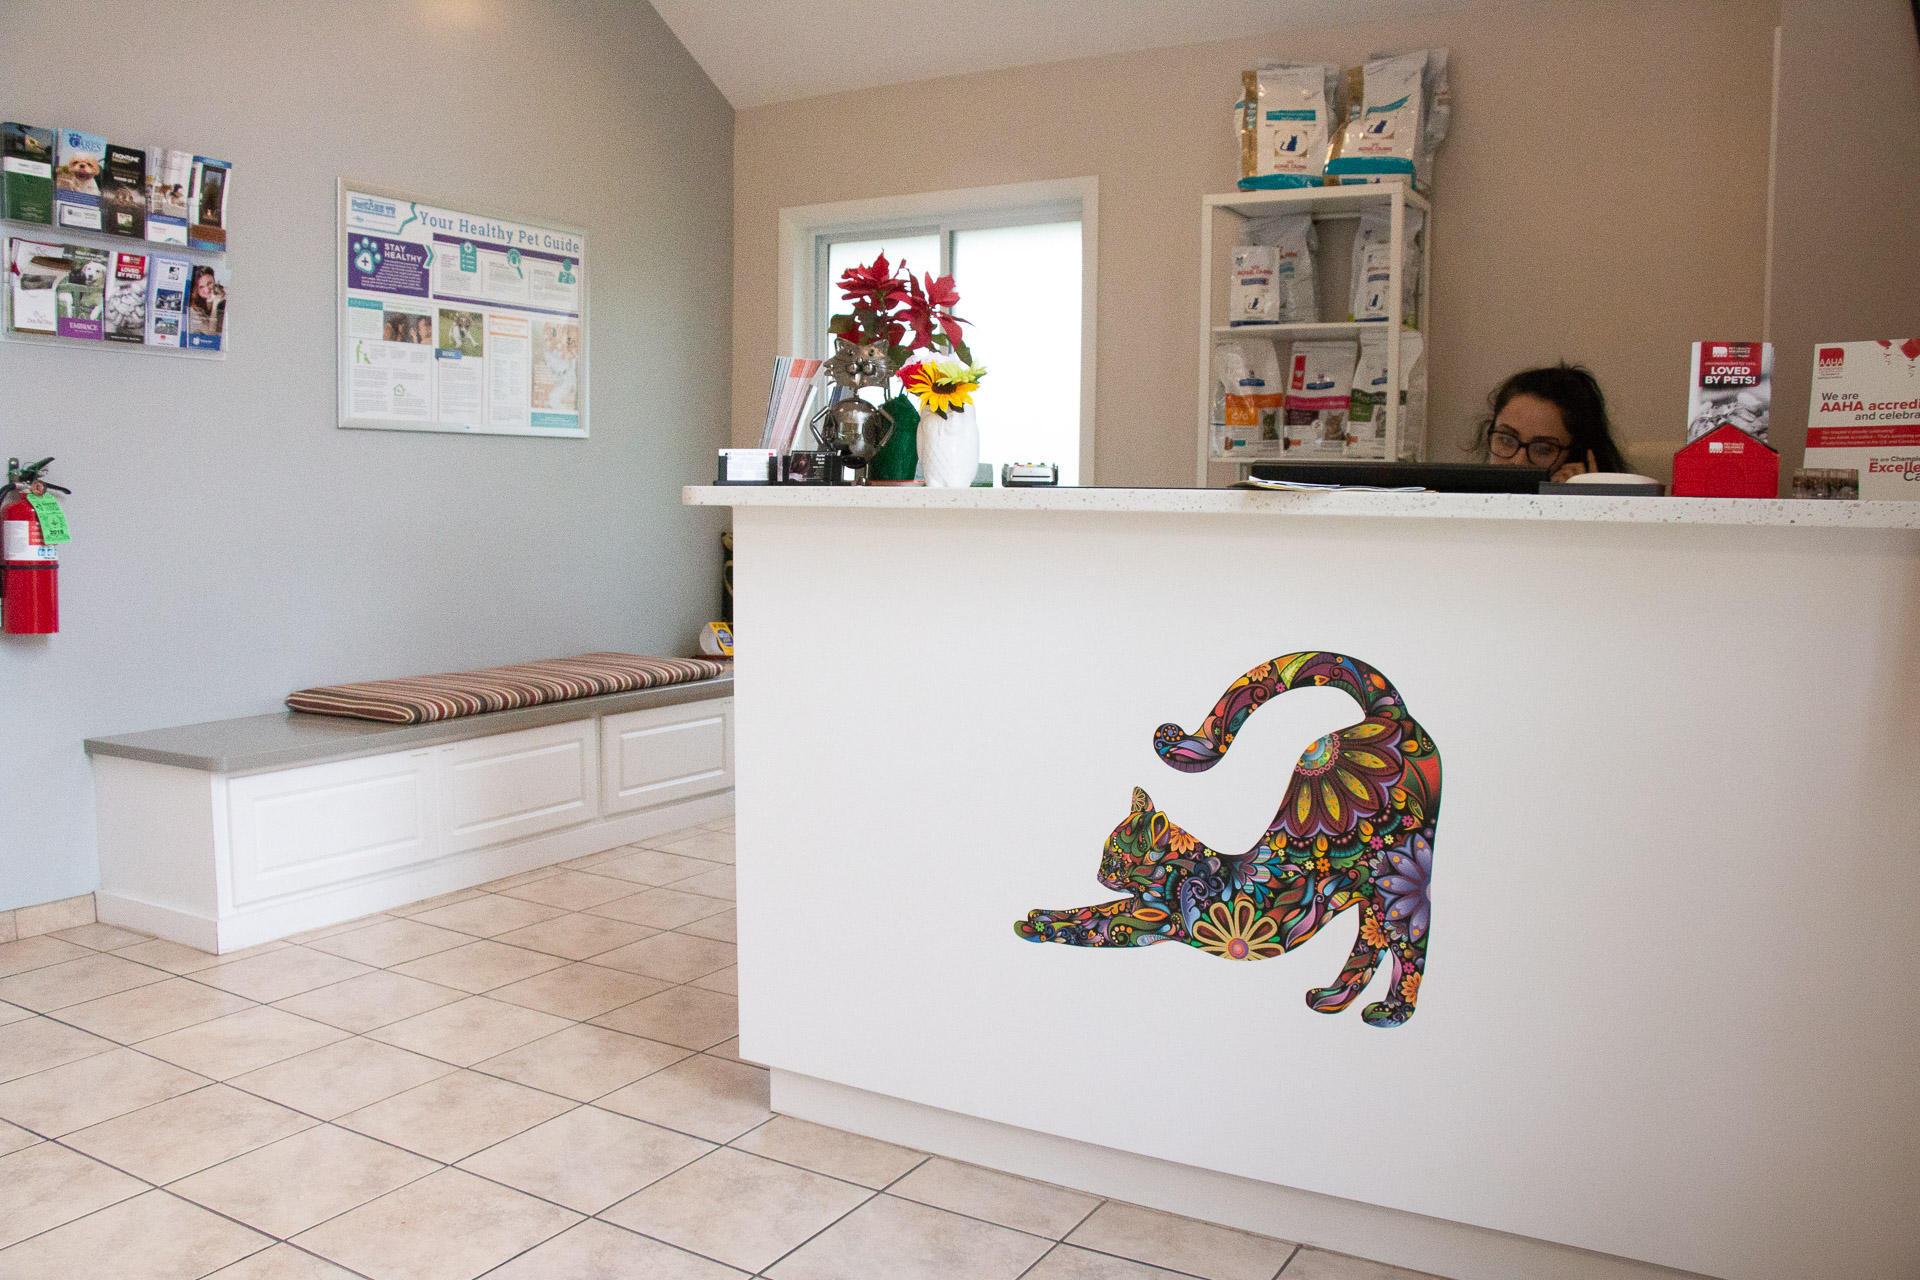 Family Pet Clinic 2 image 5